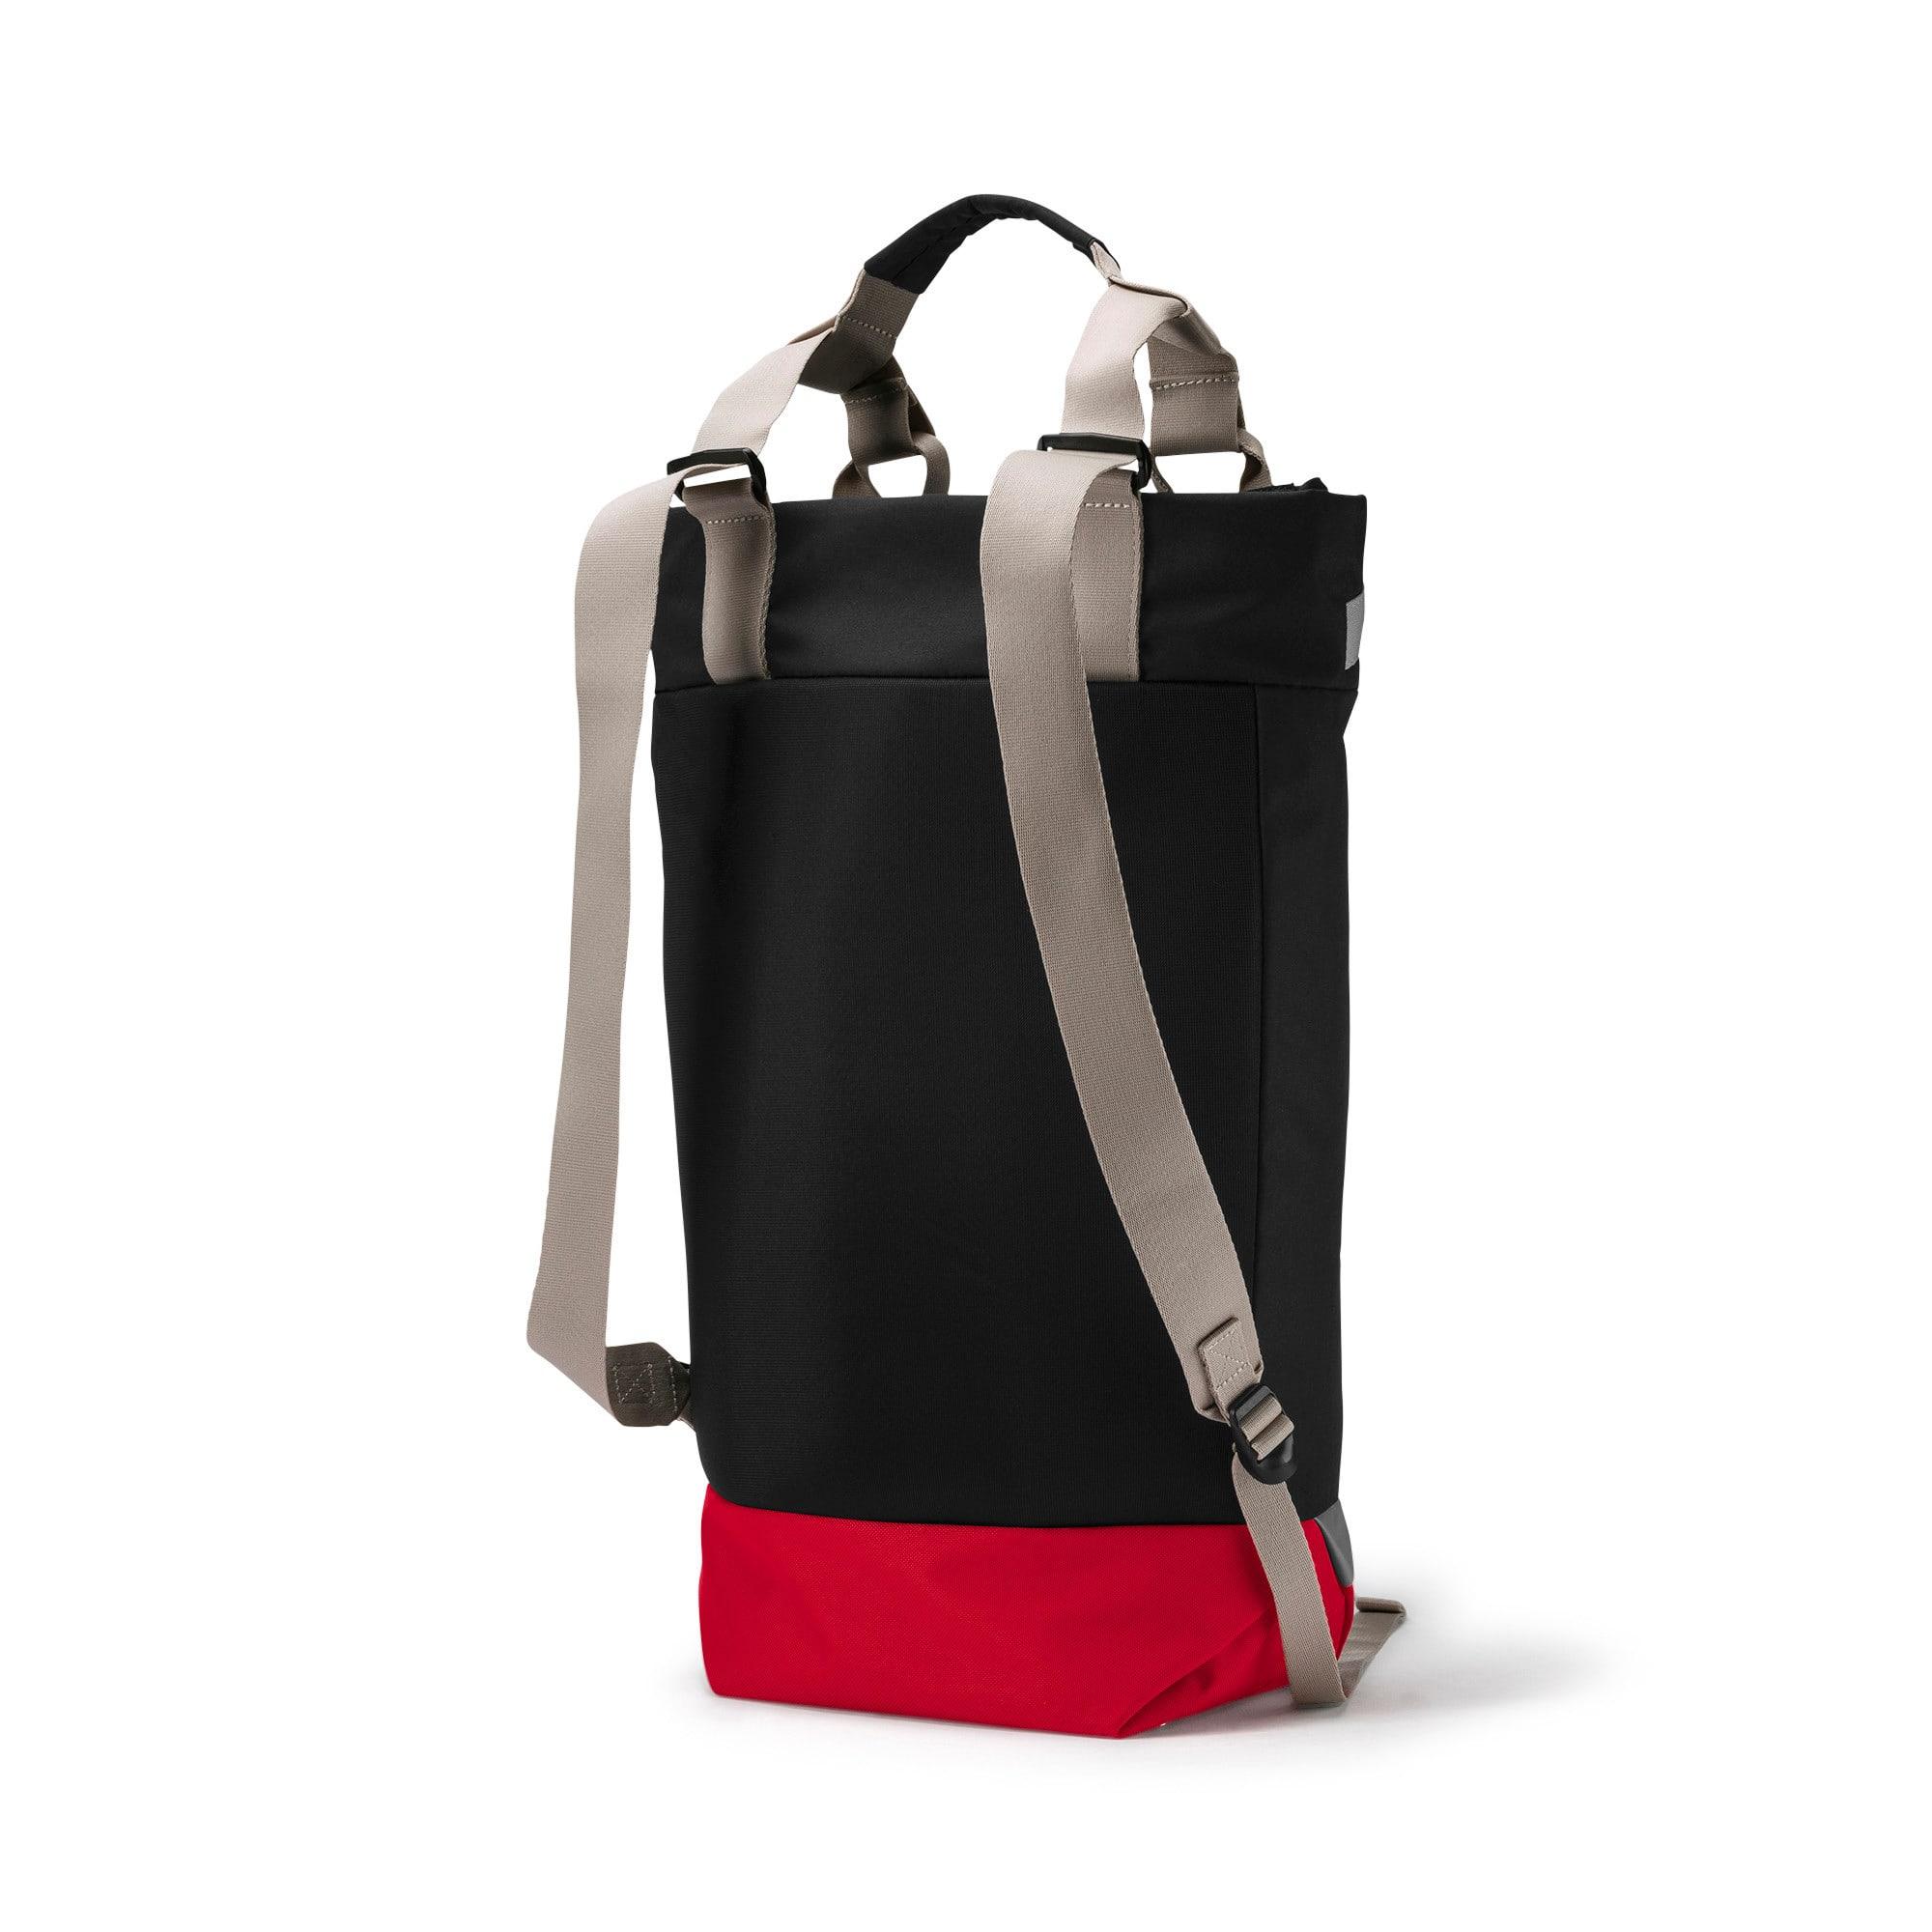 Thumbnail 2 of AC Milan Tote Backpack, Puma Black-Tango Red, medium-IND